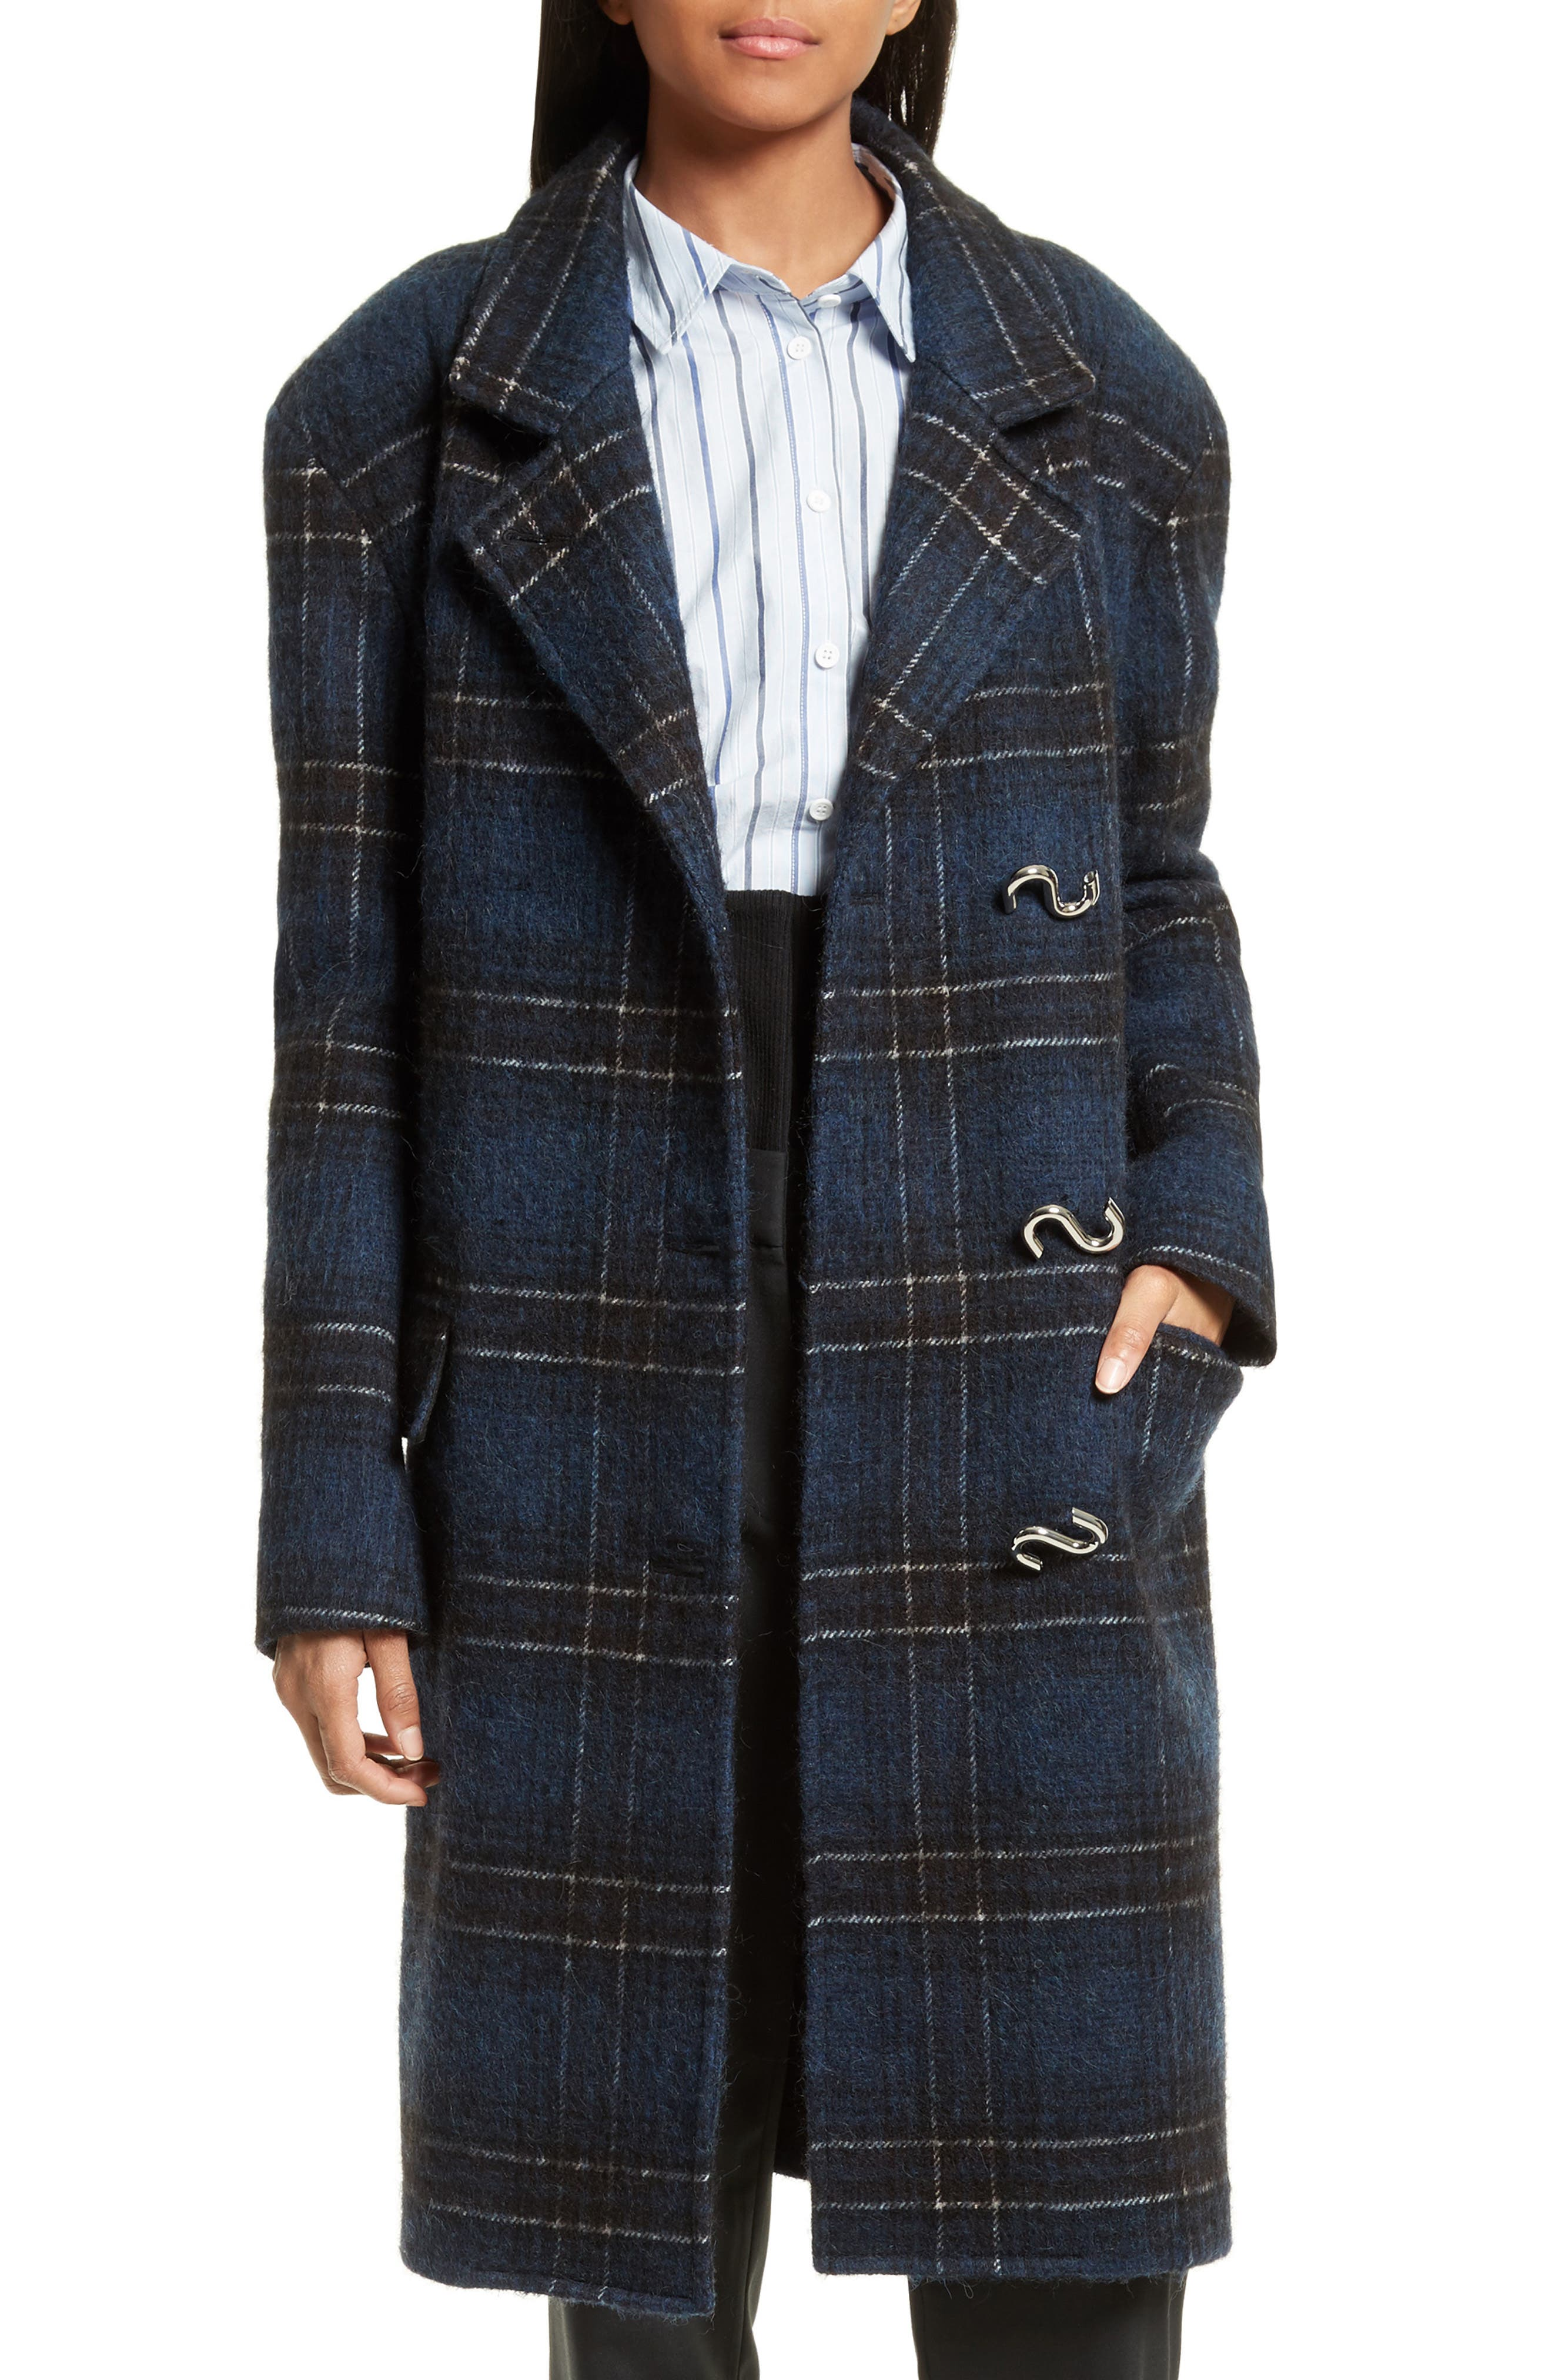 Dominic Plaid Oversize Coat,                             Main thumbnail 1, color,                             Navy Multi